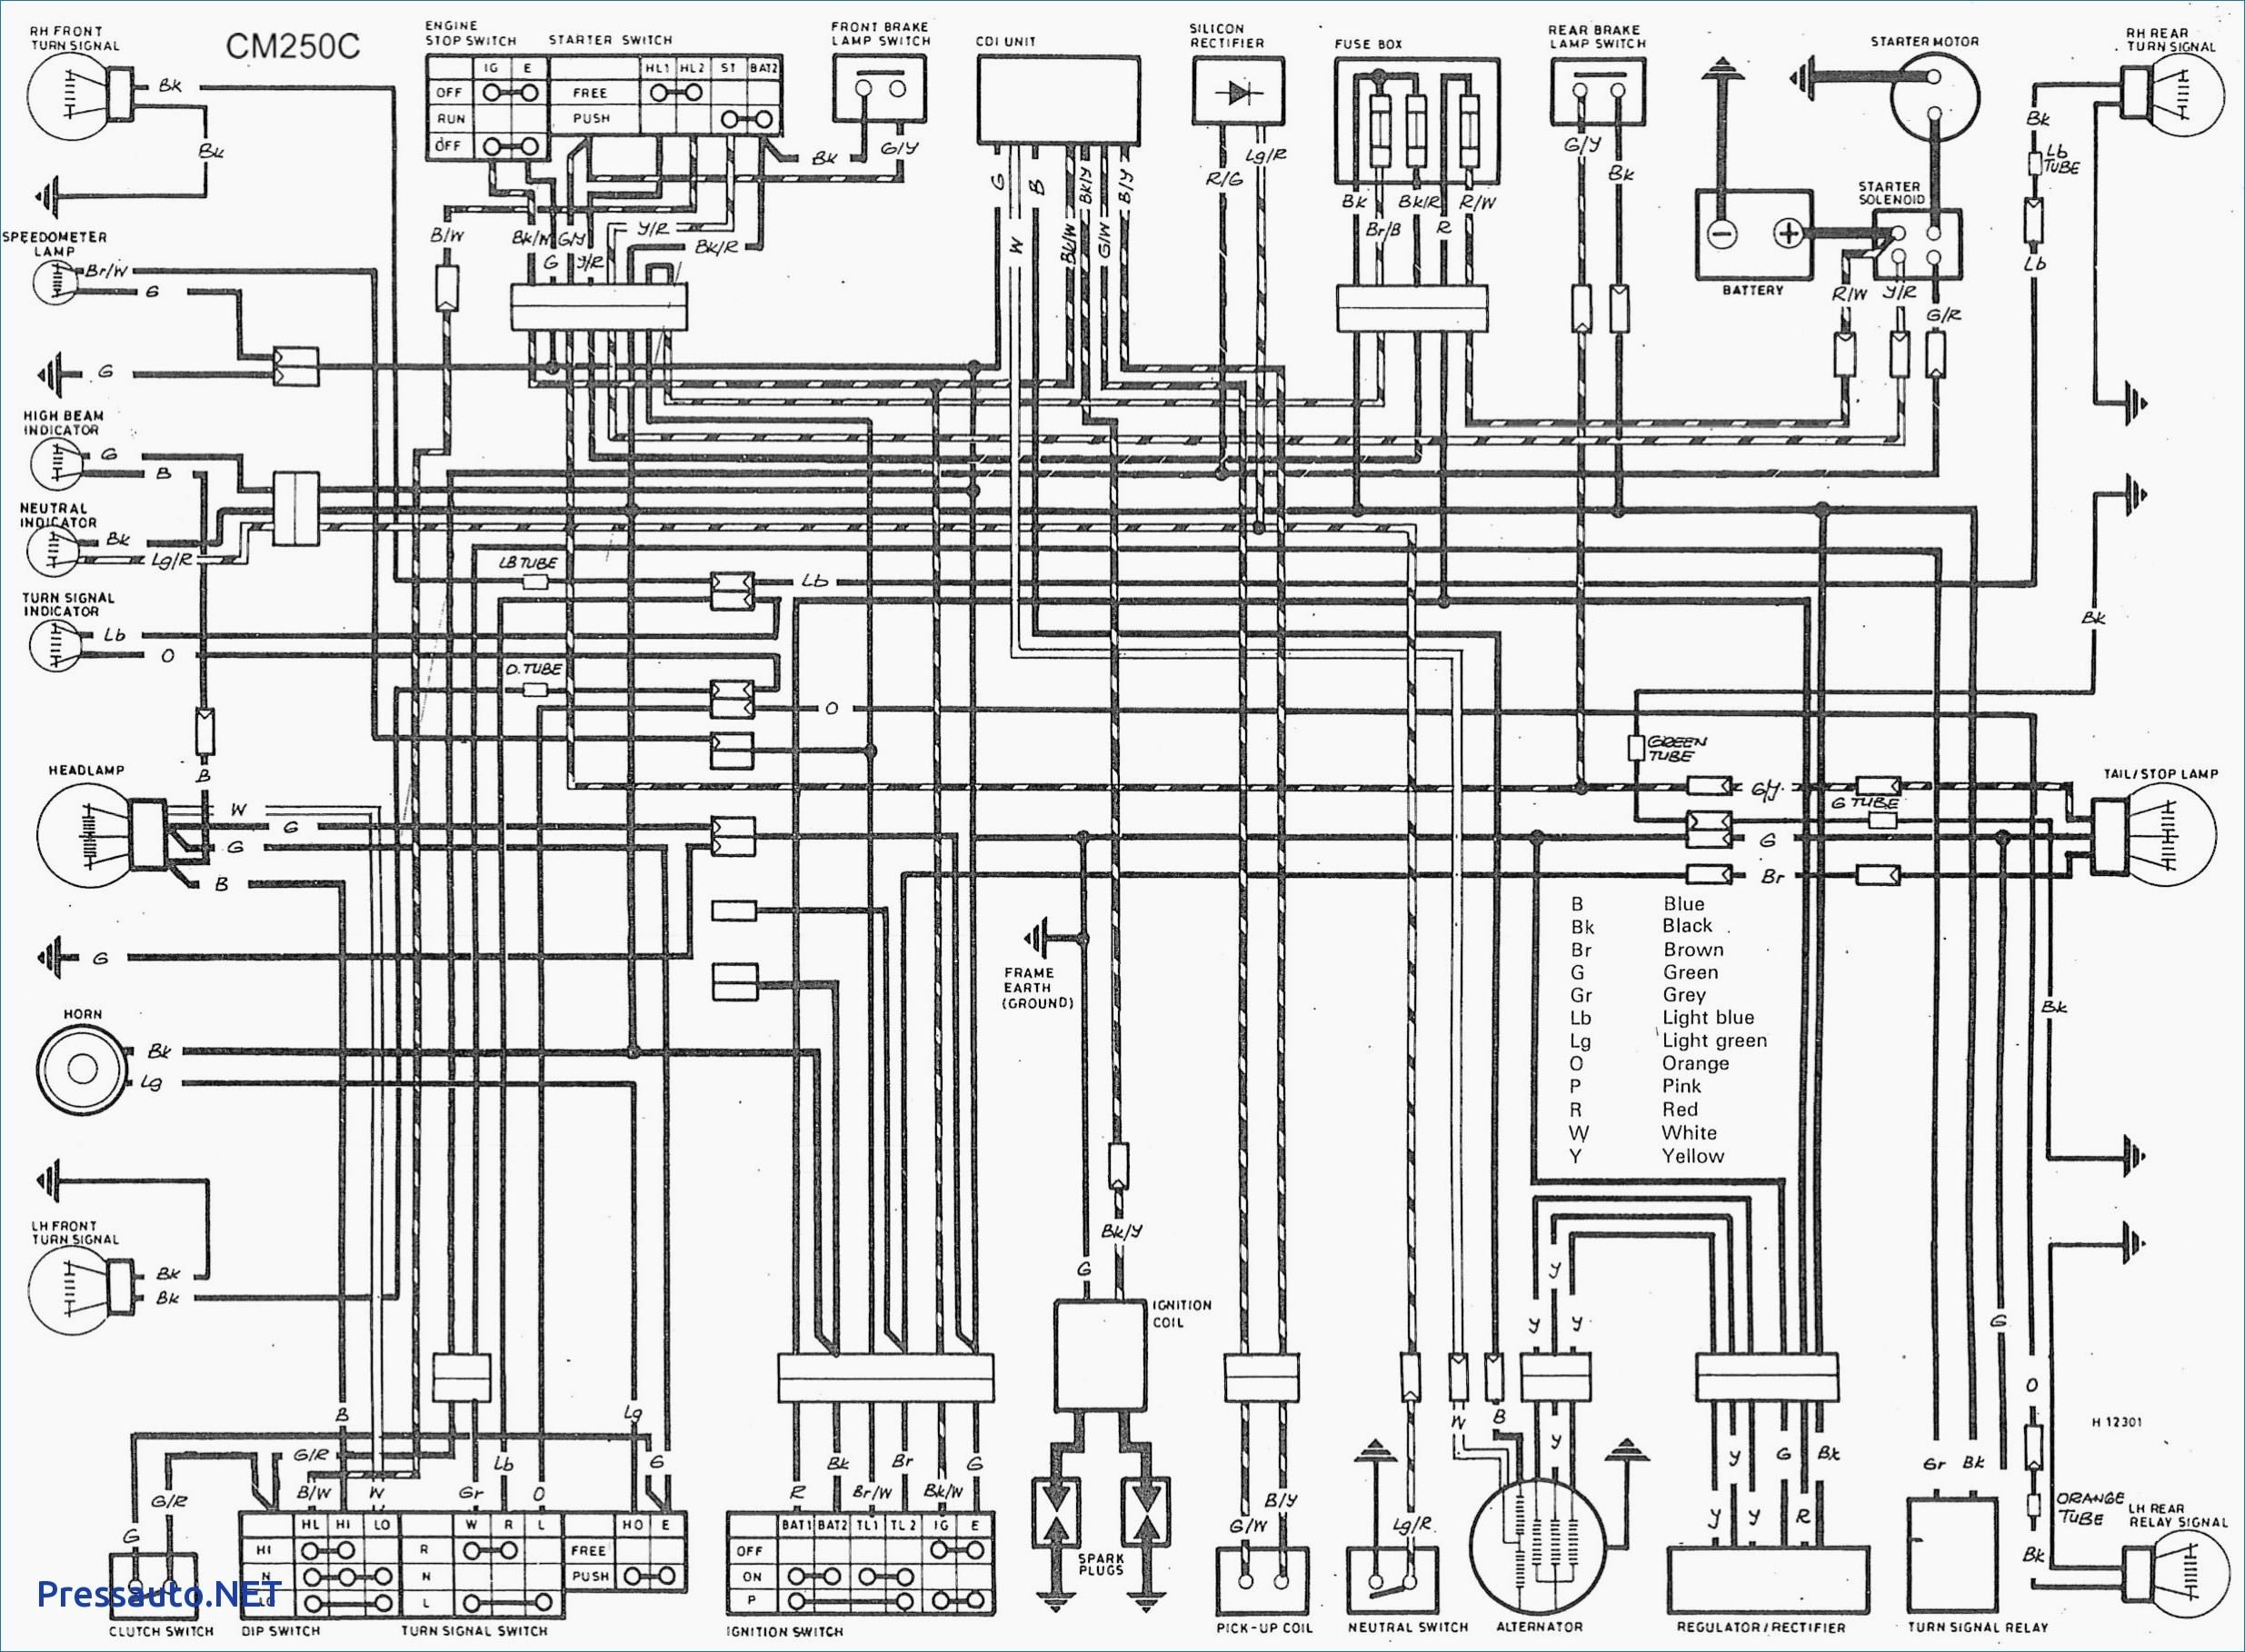 Honda Wiring Diagram Modern Honda Vfr800 Wiring Diagram Pattern Electrical Diagram Of Honda Wiring Diagram